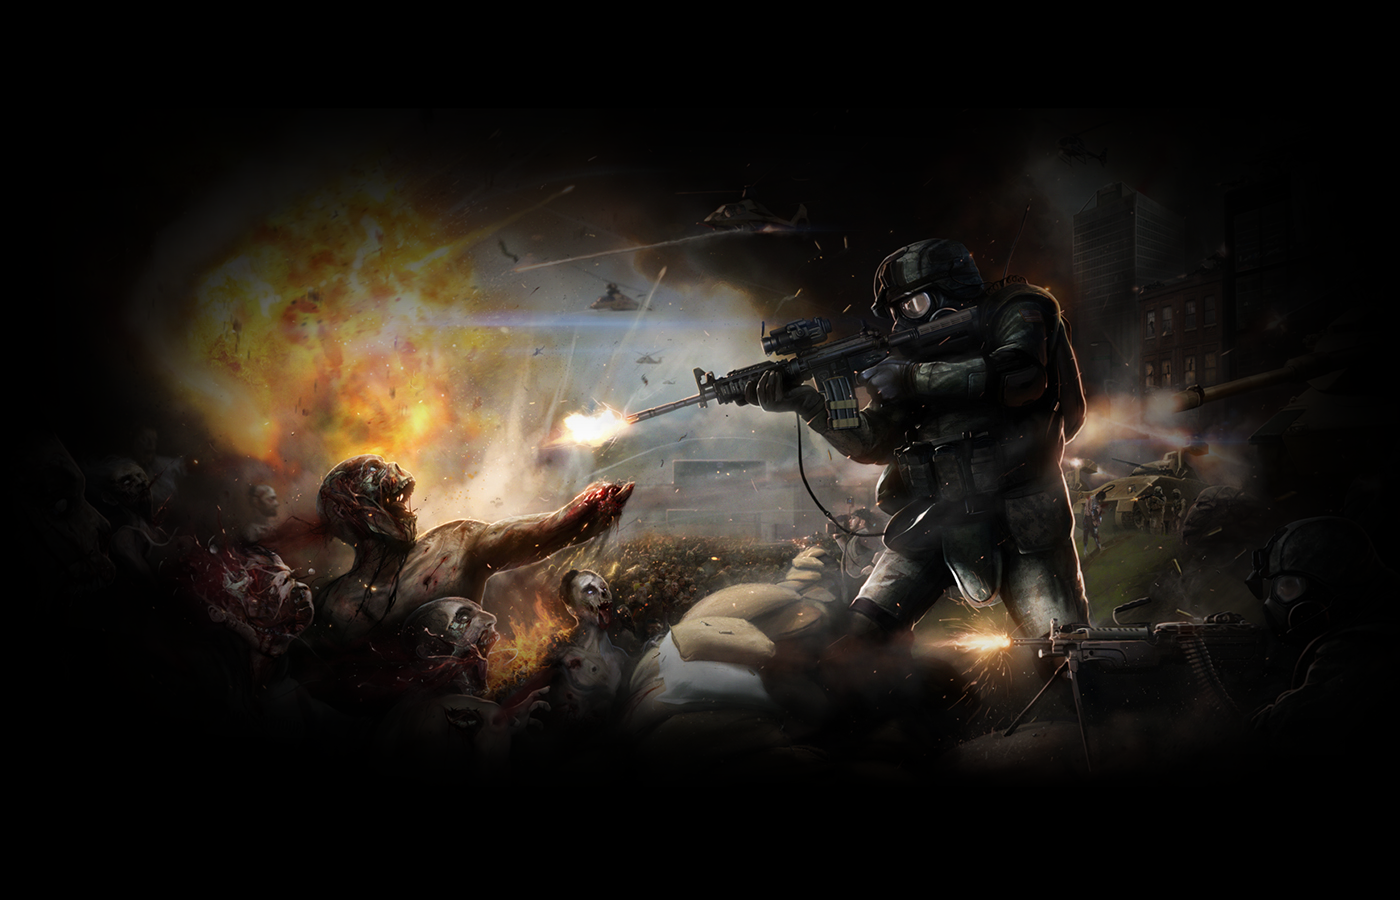 Zombie+Wallpaper+++(1)